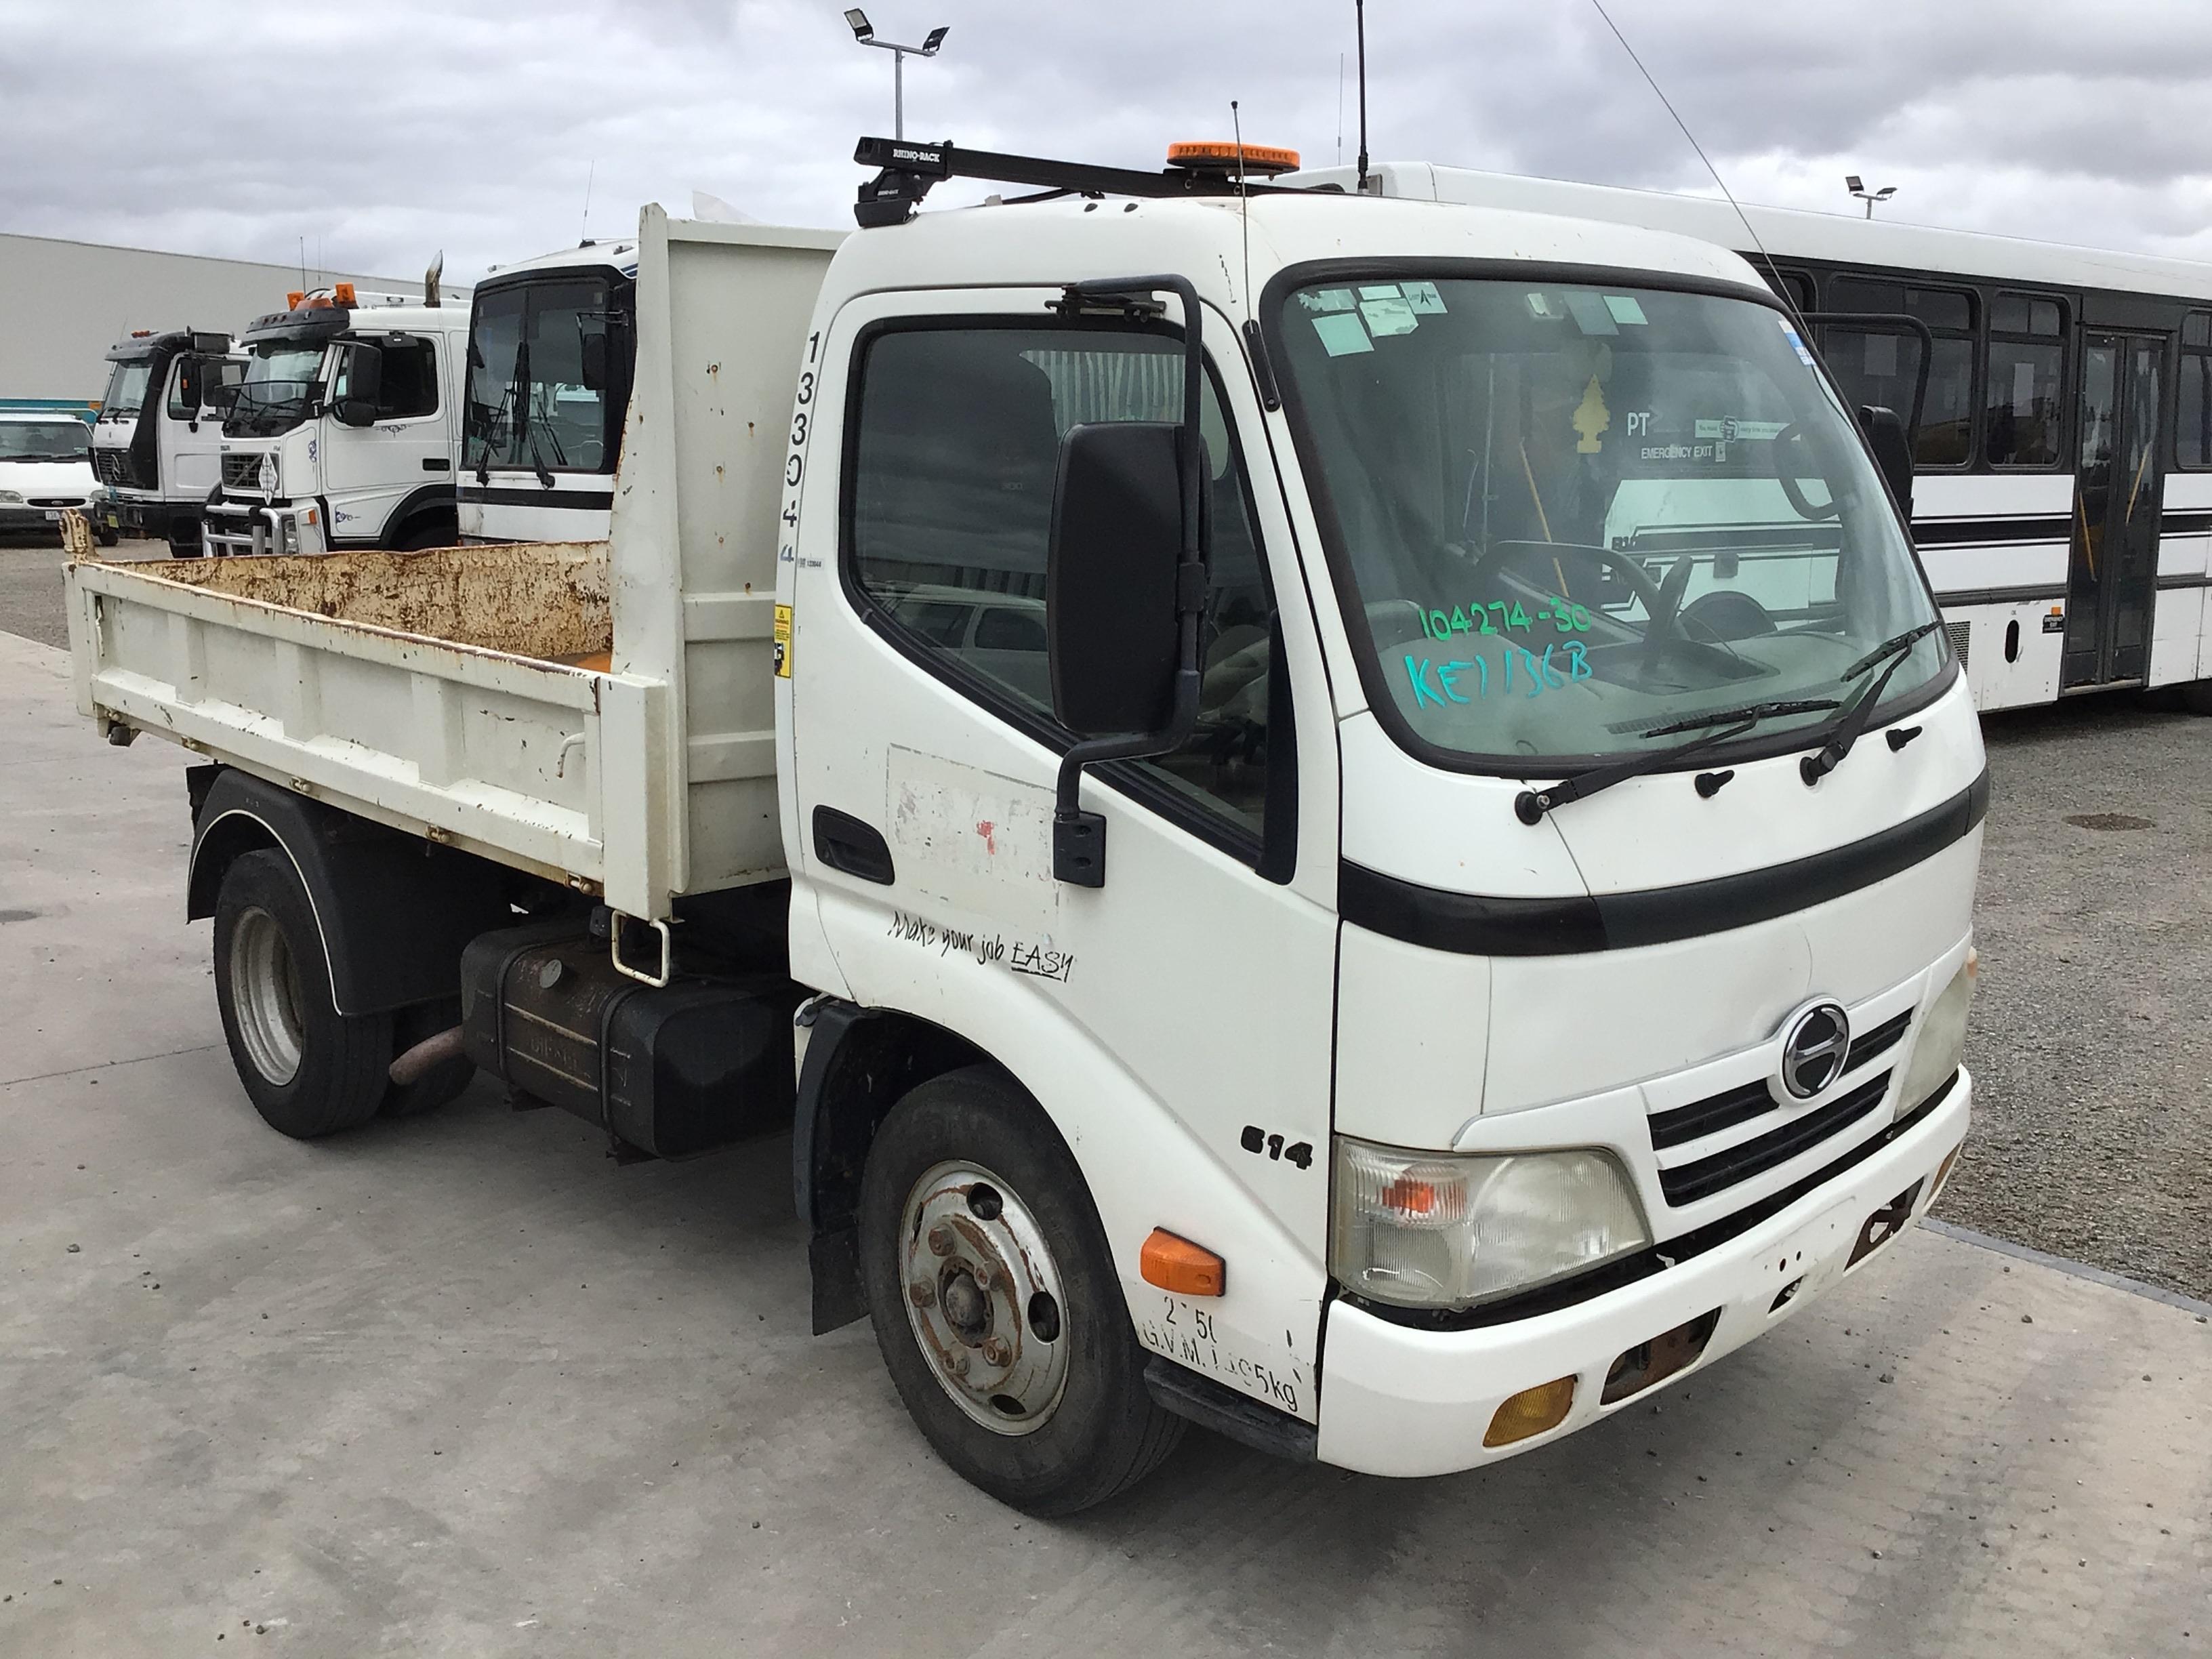 2009 Hino 615 4 x 2 Tipper Truck